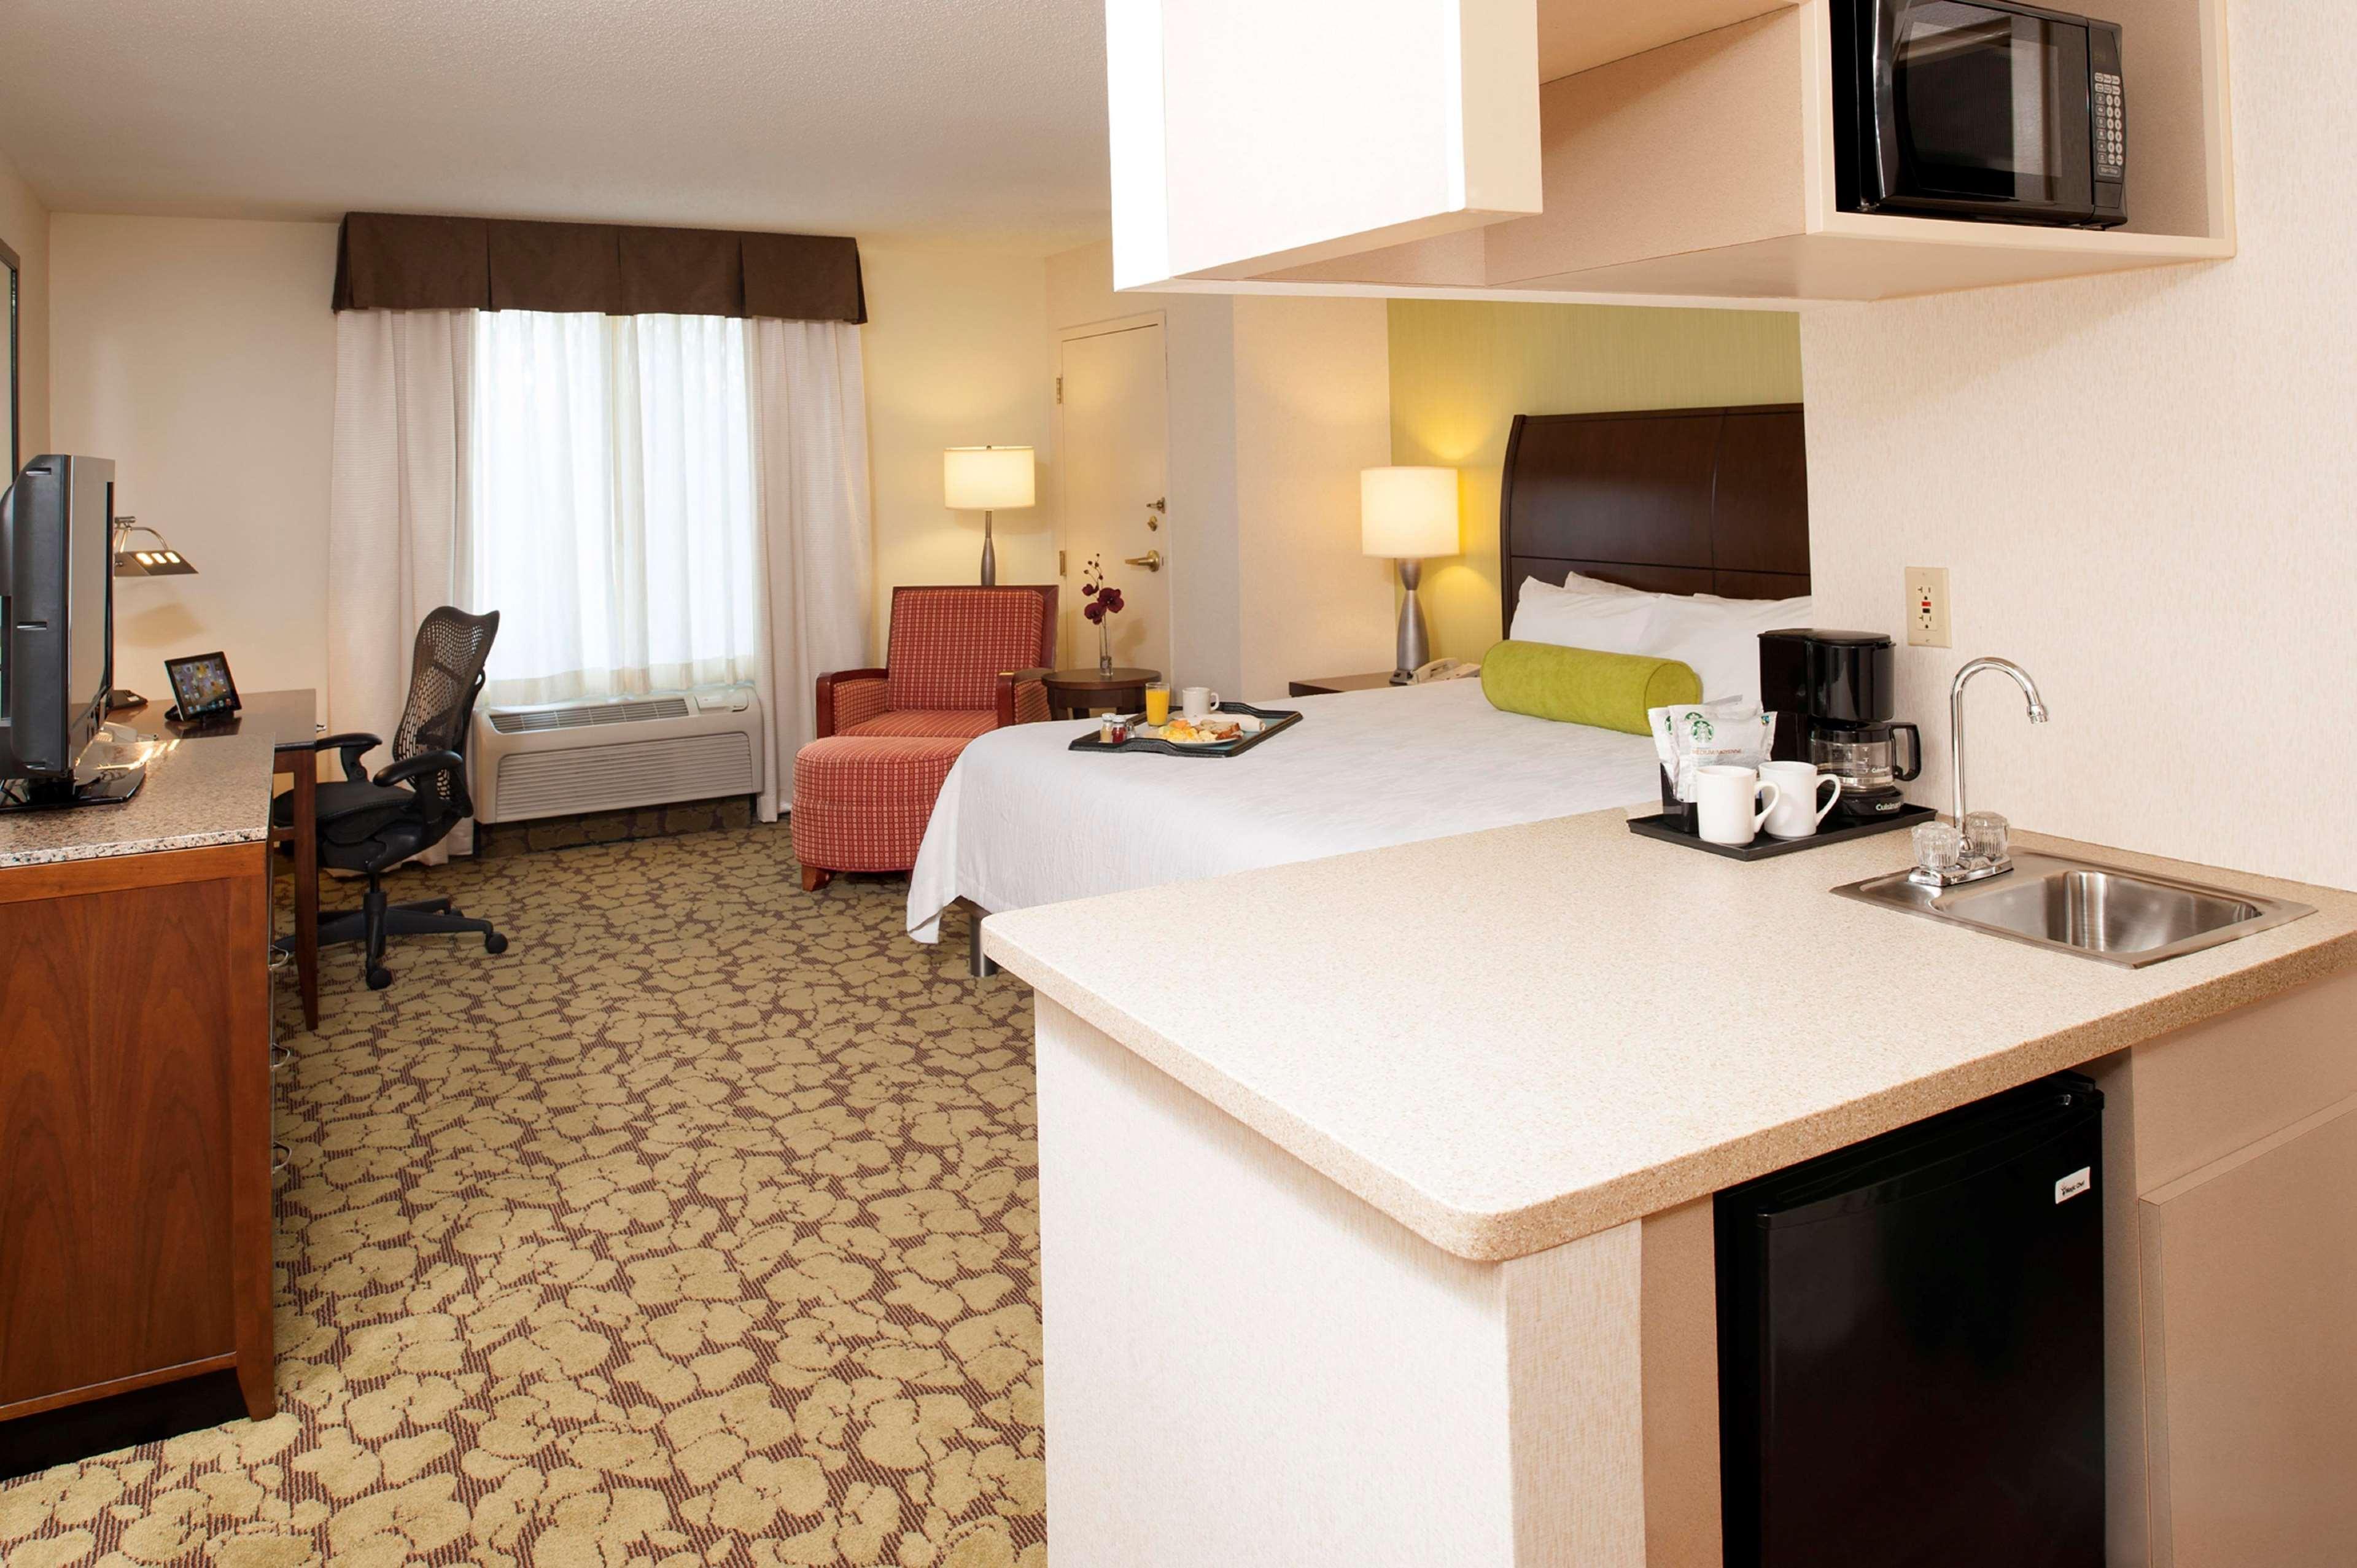 Good Hilton Garden Inn Plymouth 14600 N Sheldon Road Plymouth, MI Hotels U0026  Motels   MapQuest